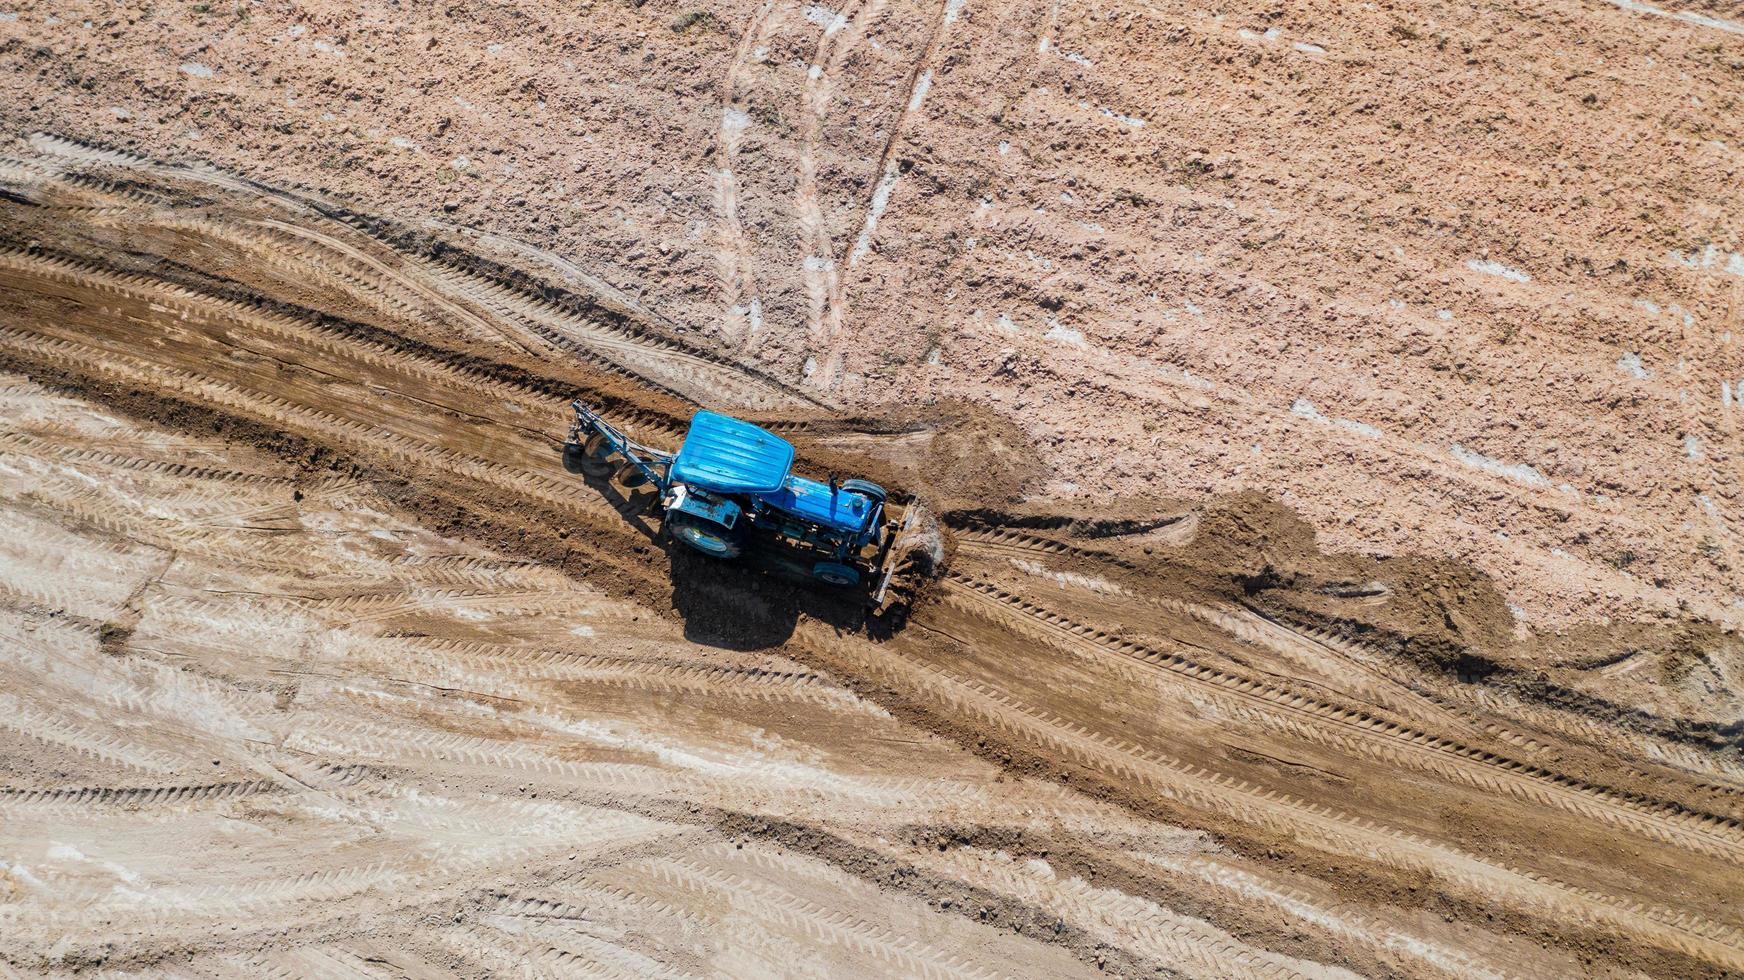 vista superior de veículos tratores agrícolas trabalhando no campo foto